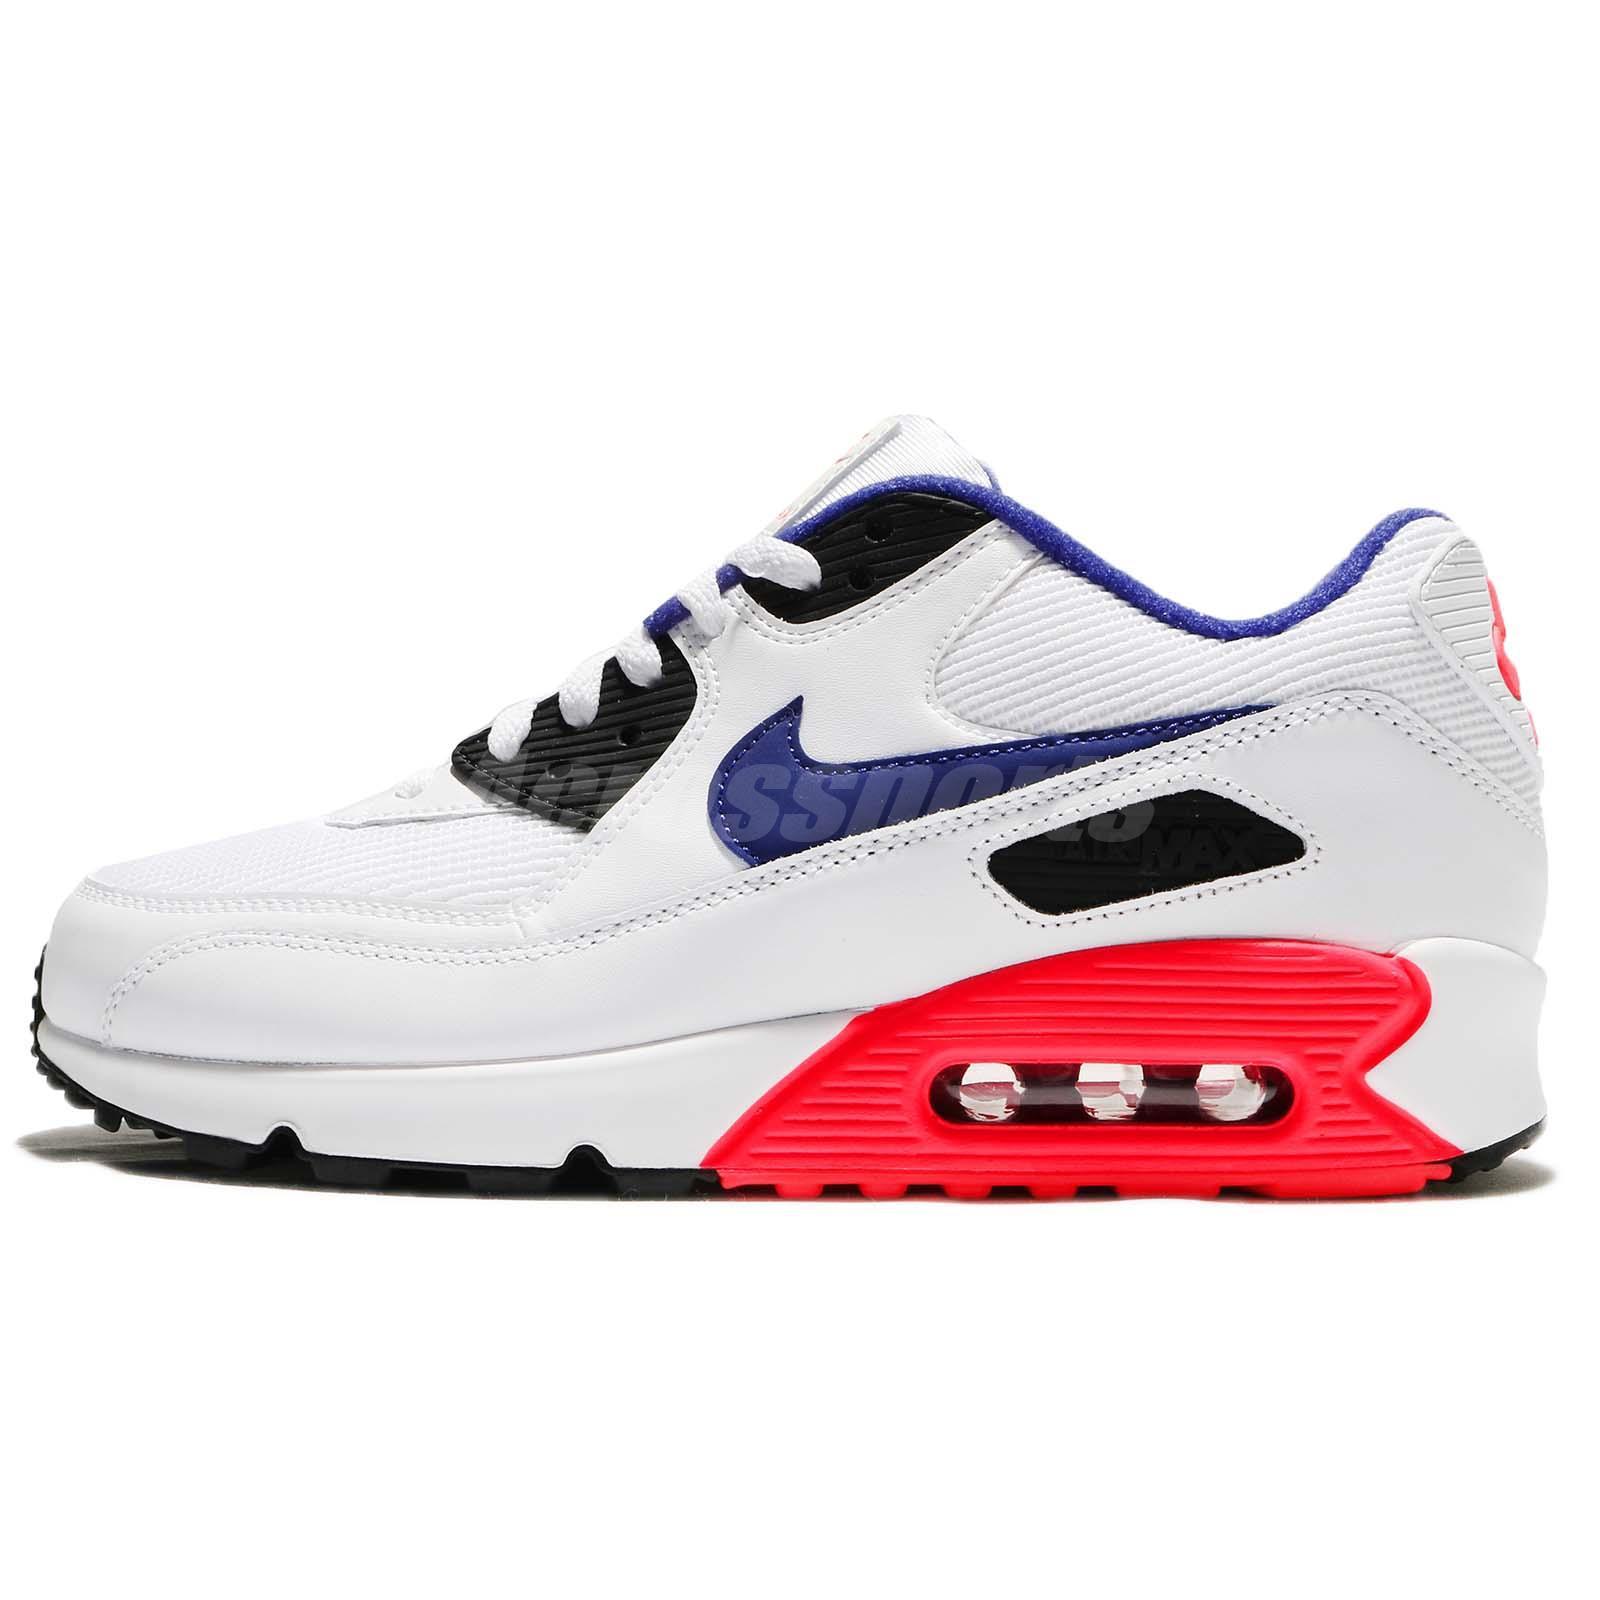 nike air max 90 essential mens running shoes nz